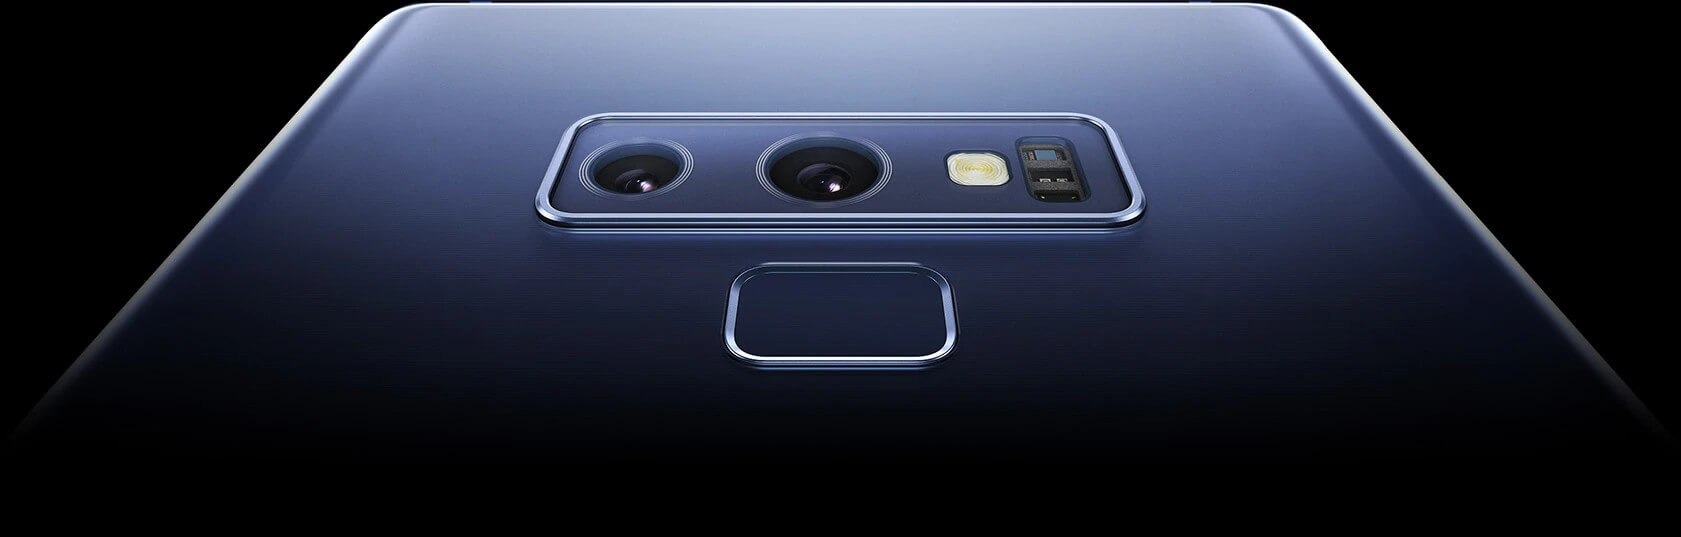 Камера Samsung Galaxy Note 9: обзор DxOMark